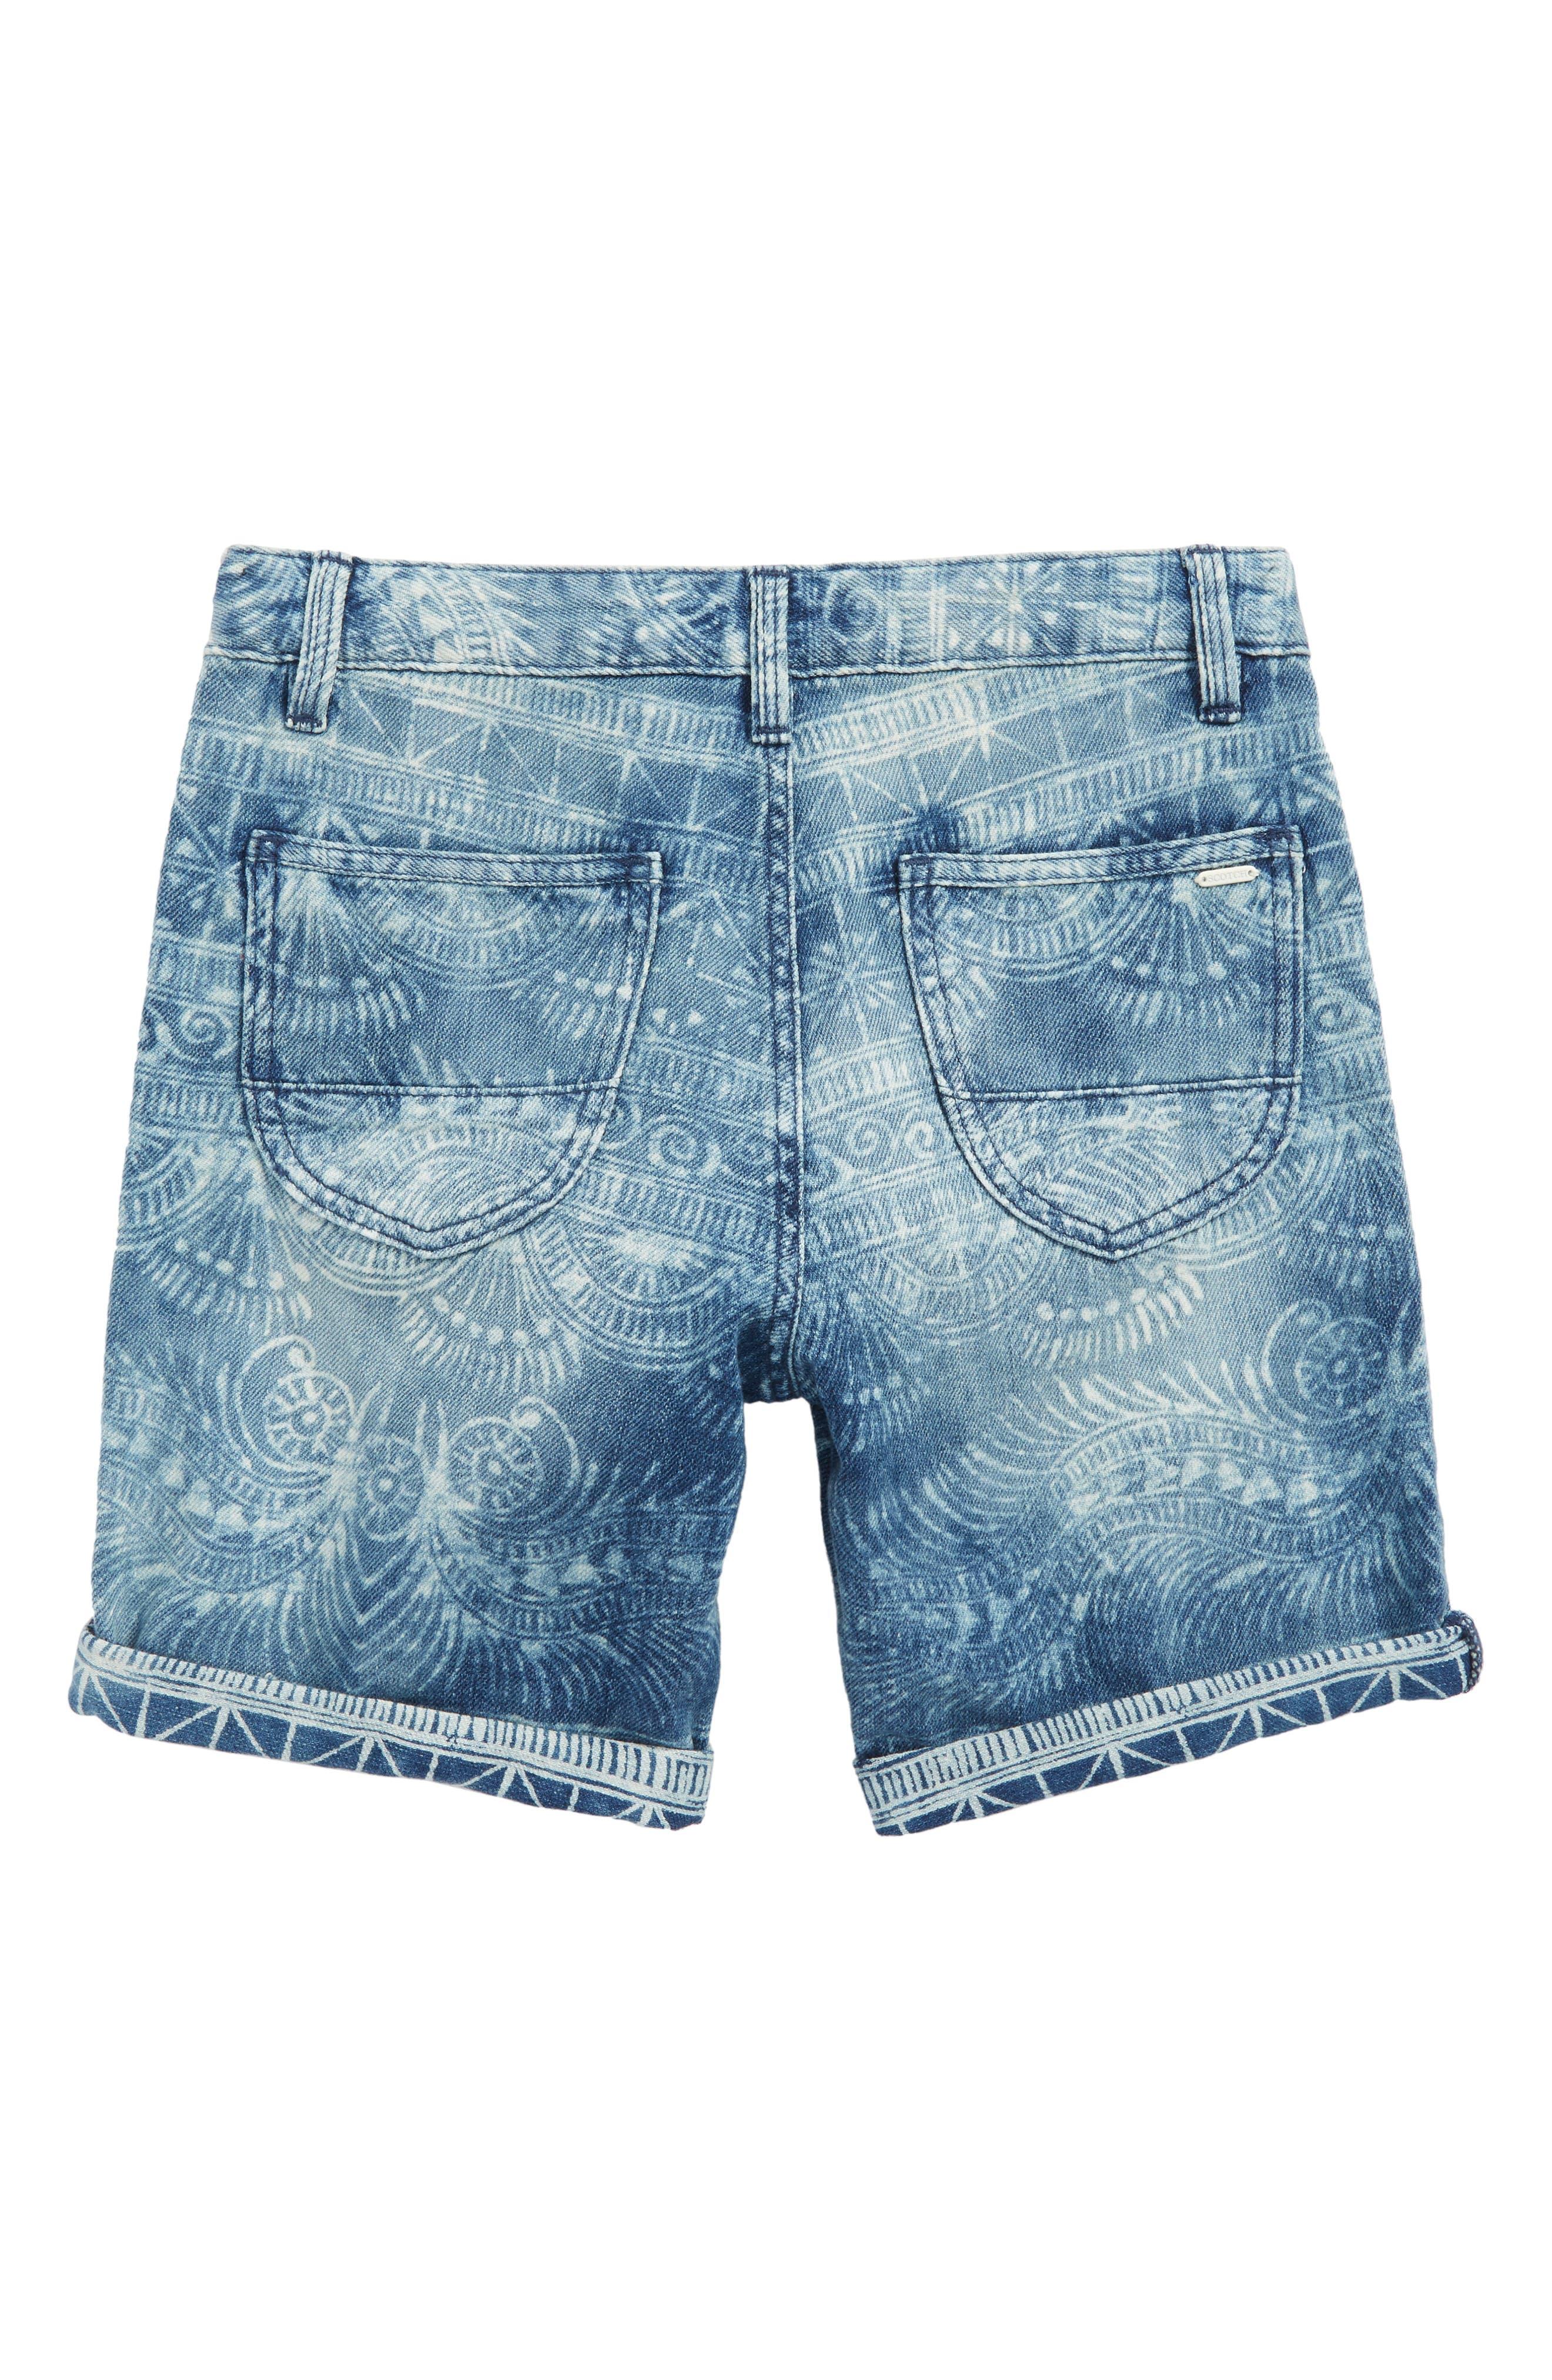 Denim Chino Shorts,                             Alternate thumbnail 2, color,                             400